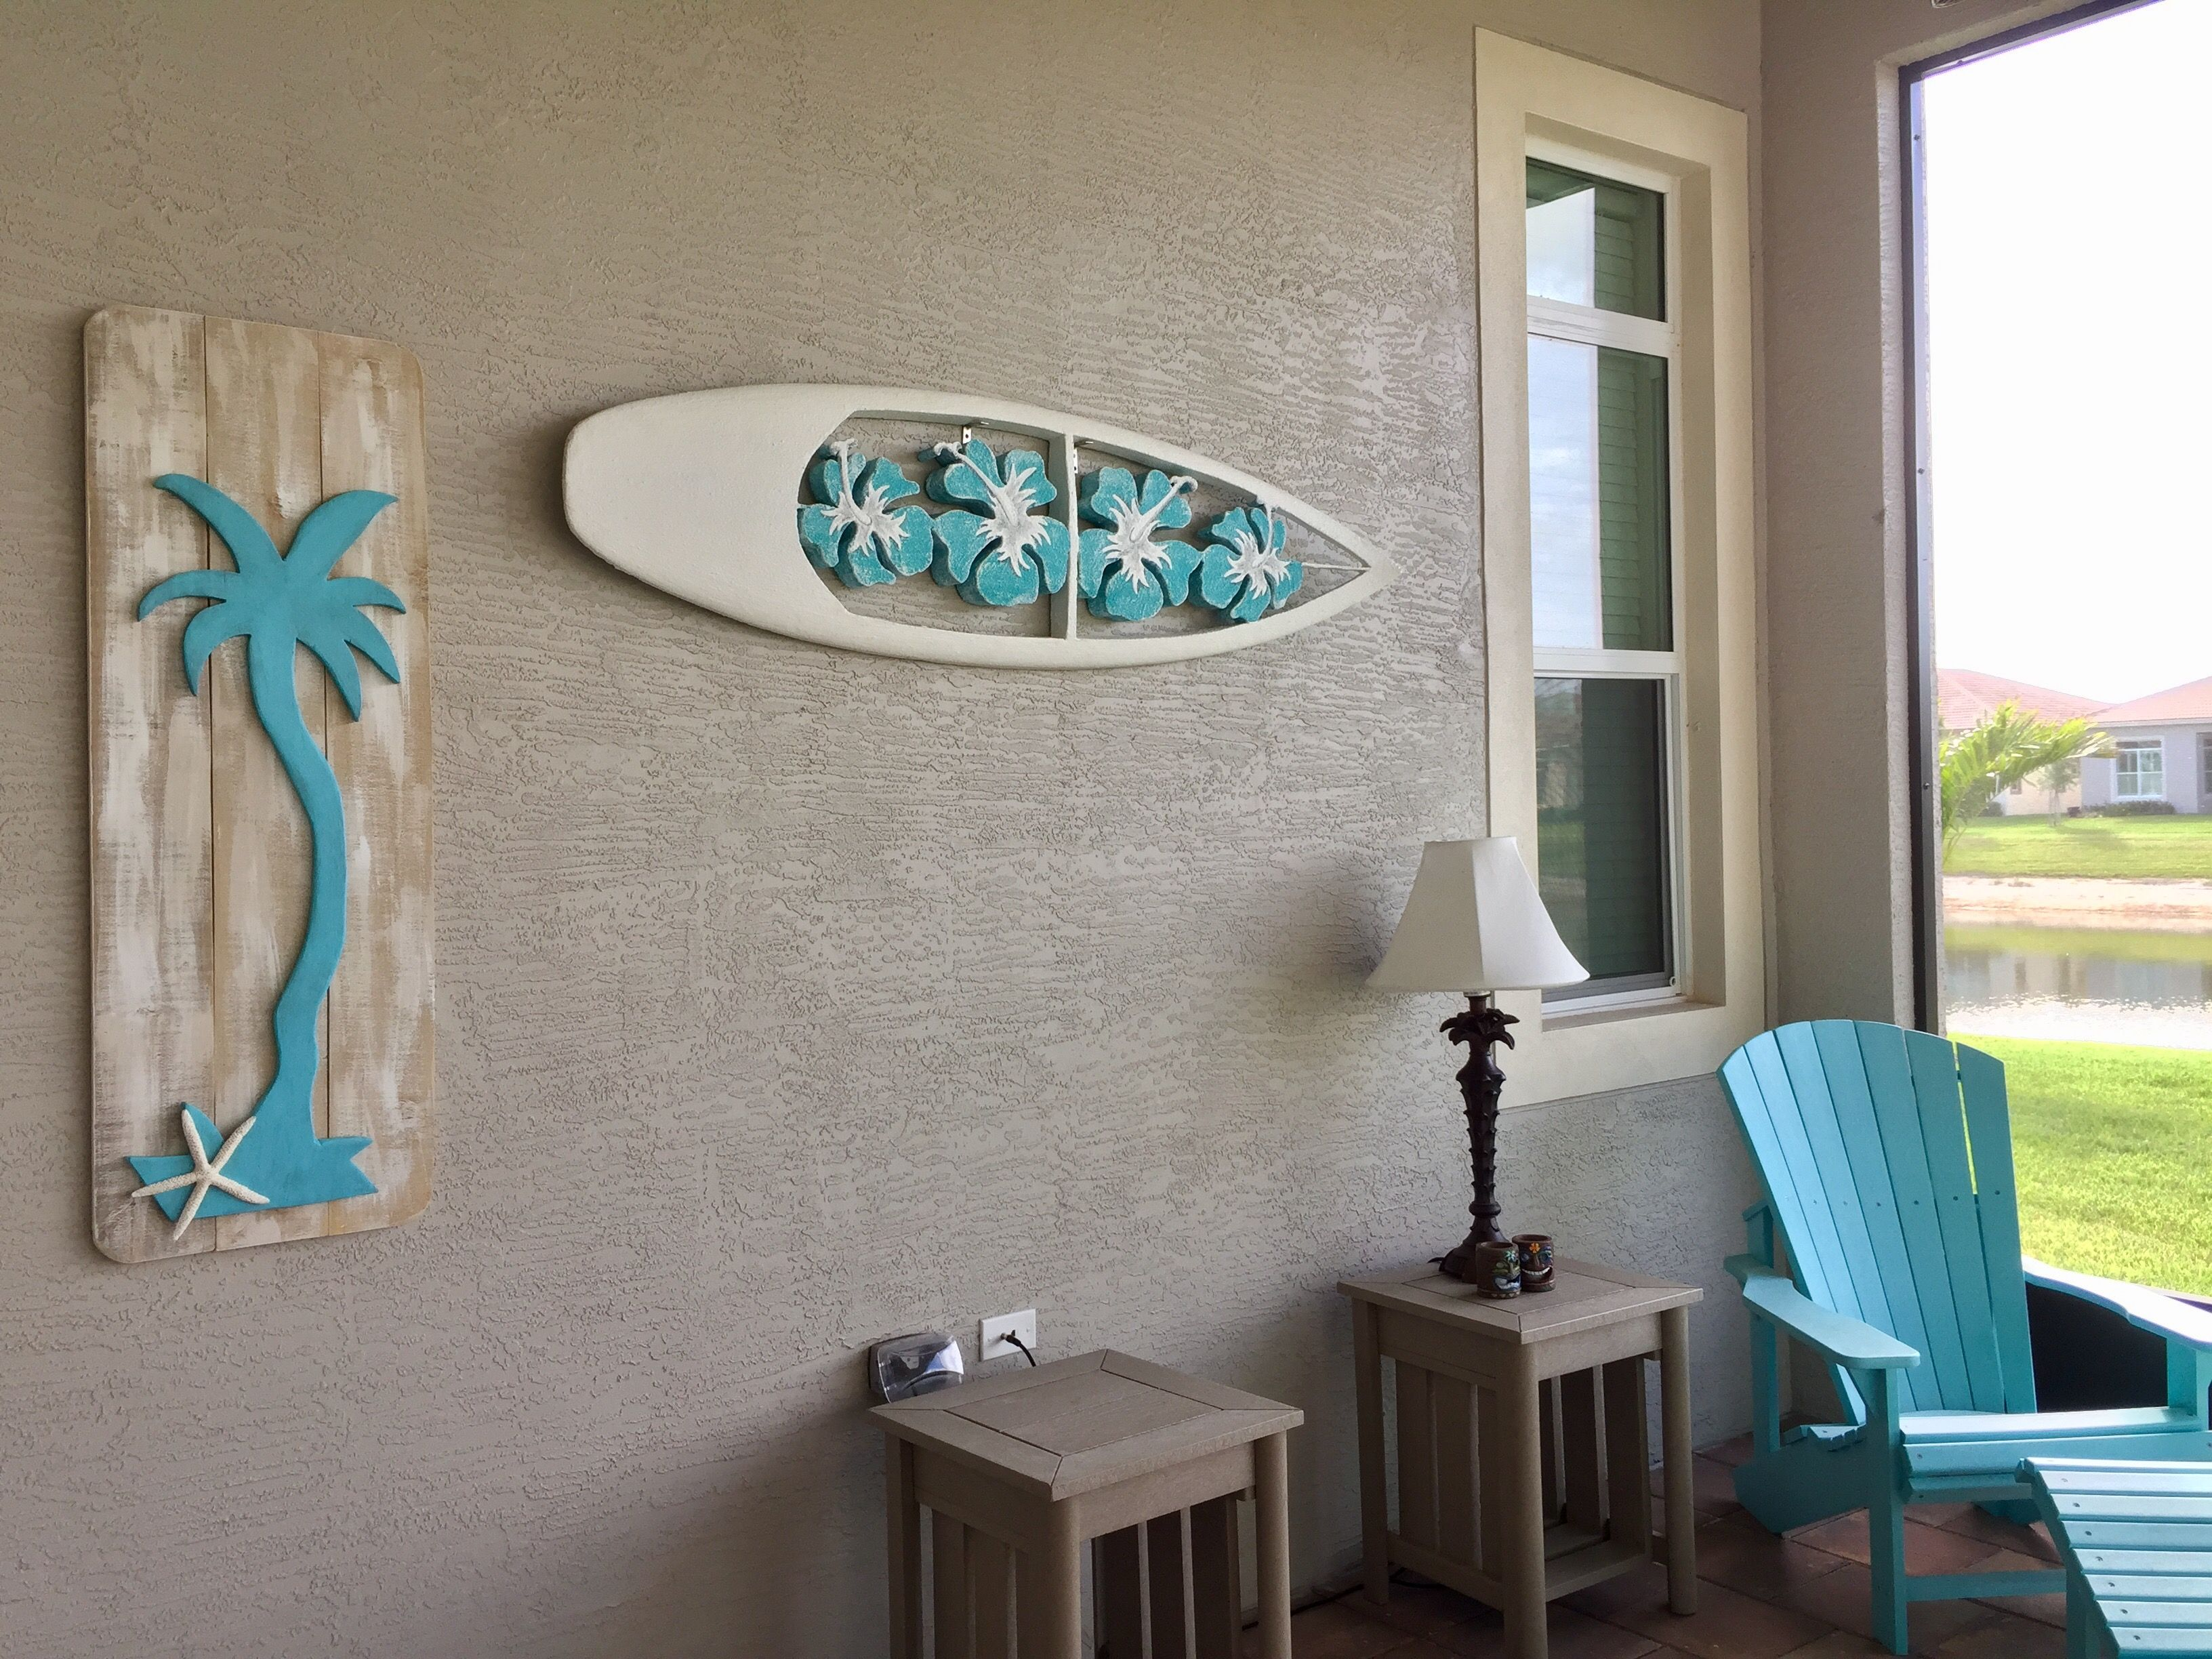 Decorating Our Lanai With Coastal Tropical Wall Art Lanai